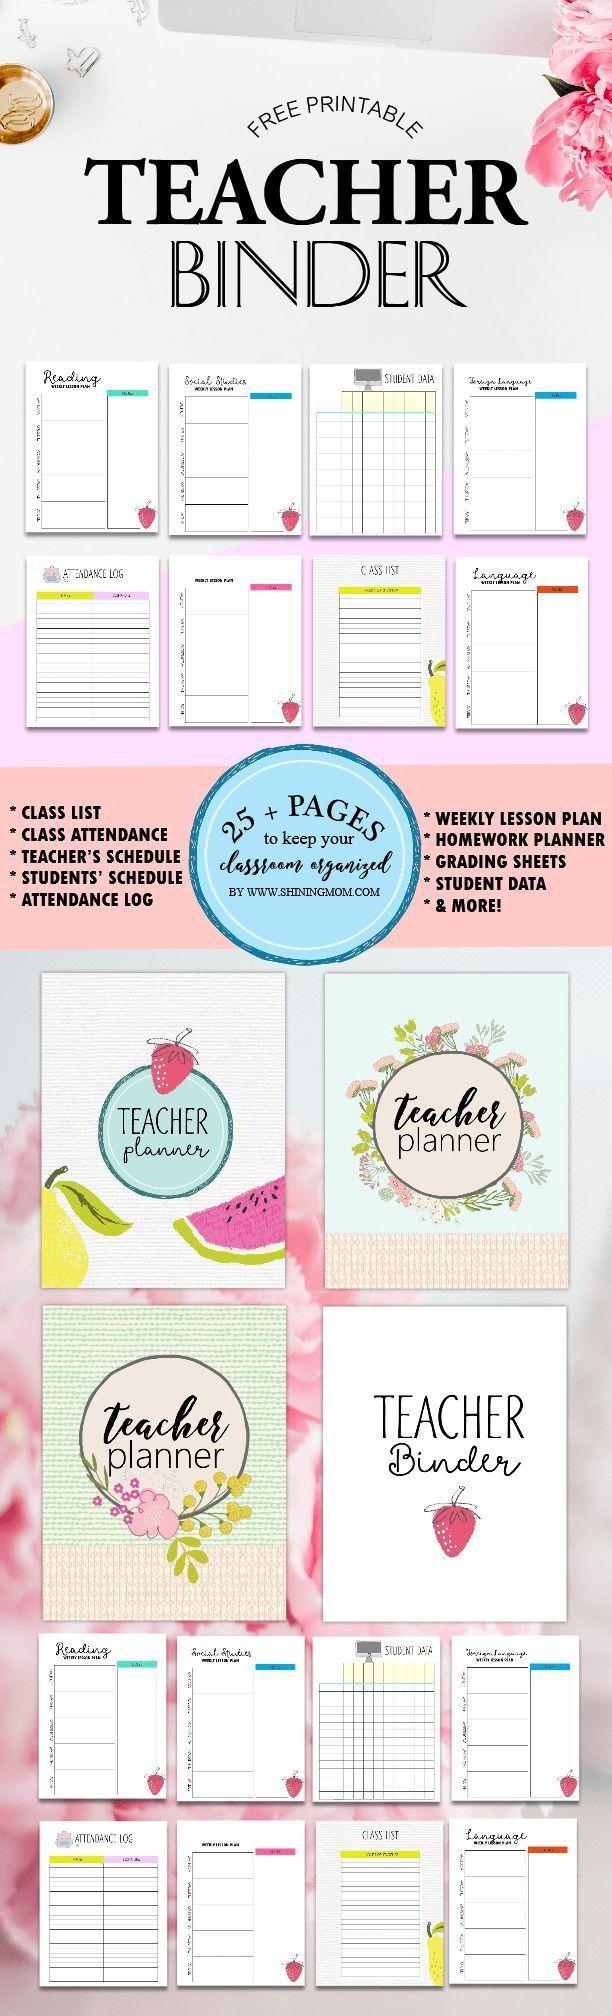 free teacher binder printables over 25 pretty planning templates